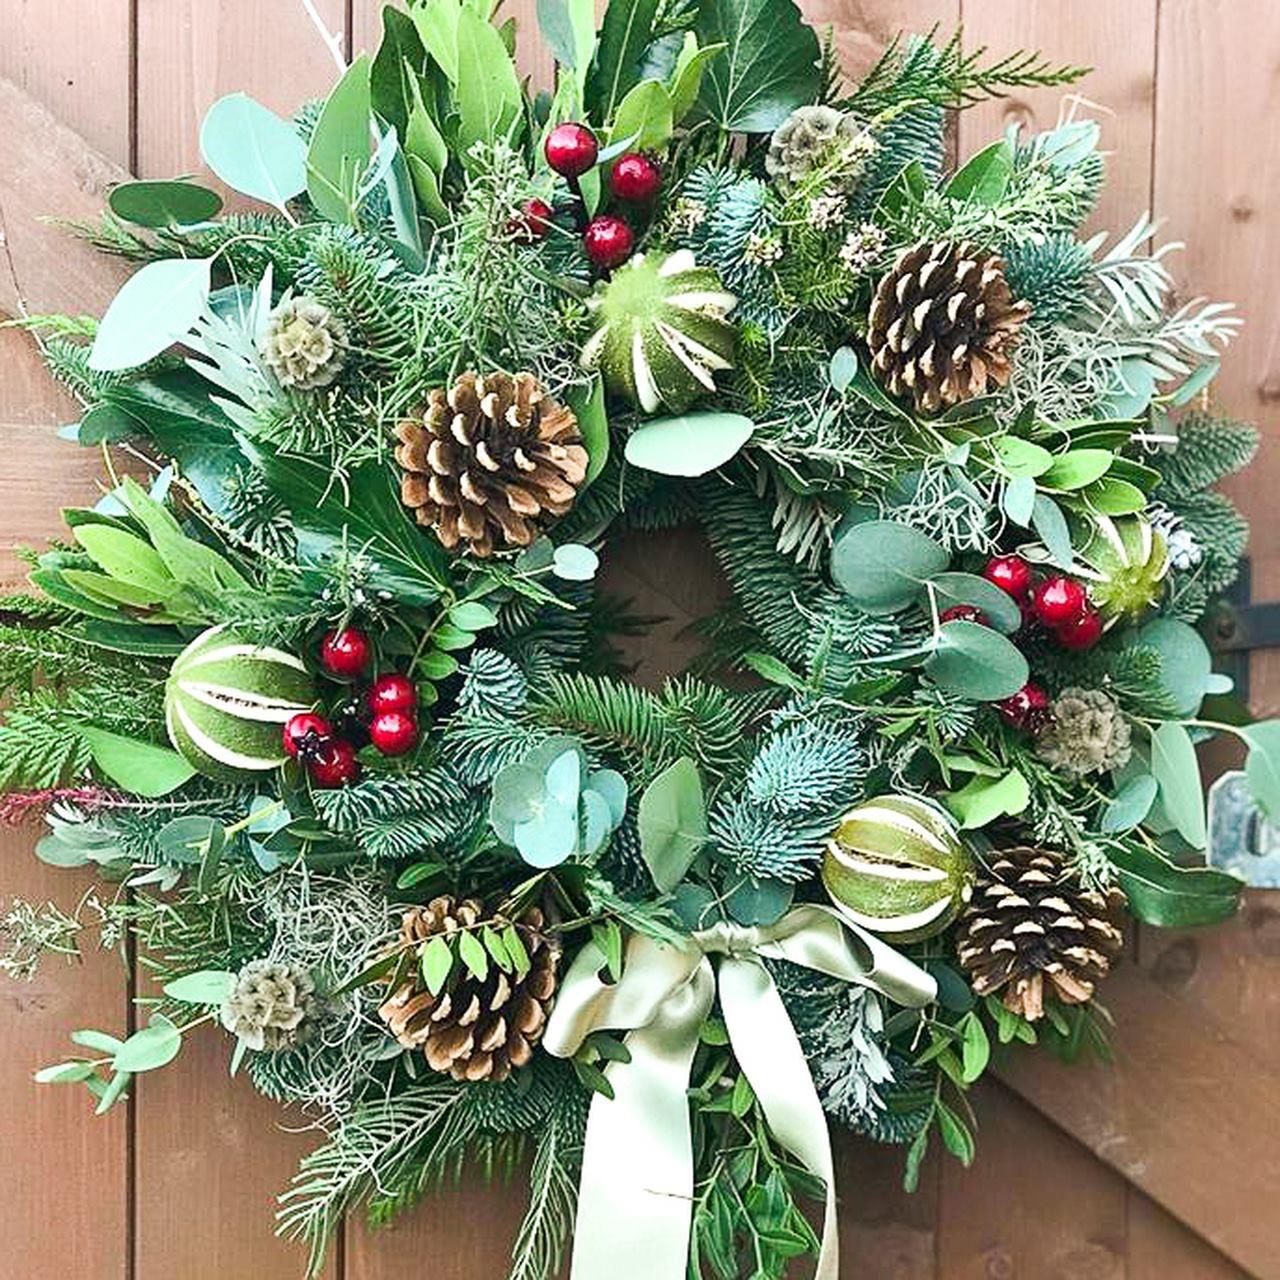 Christmas Wreath Making Workshop With Paula Barwell & Karen Mallinder - Price £35